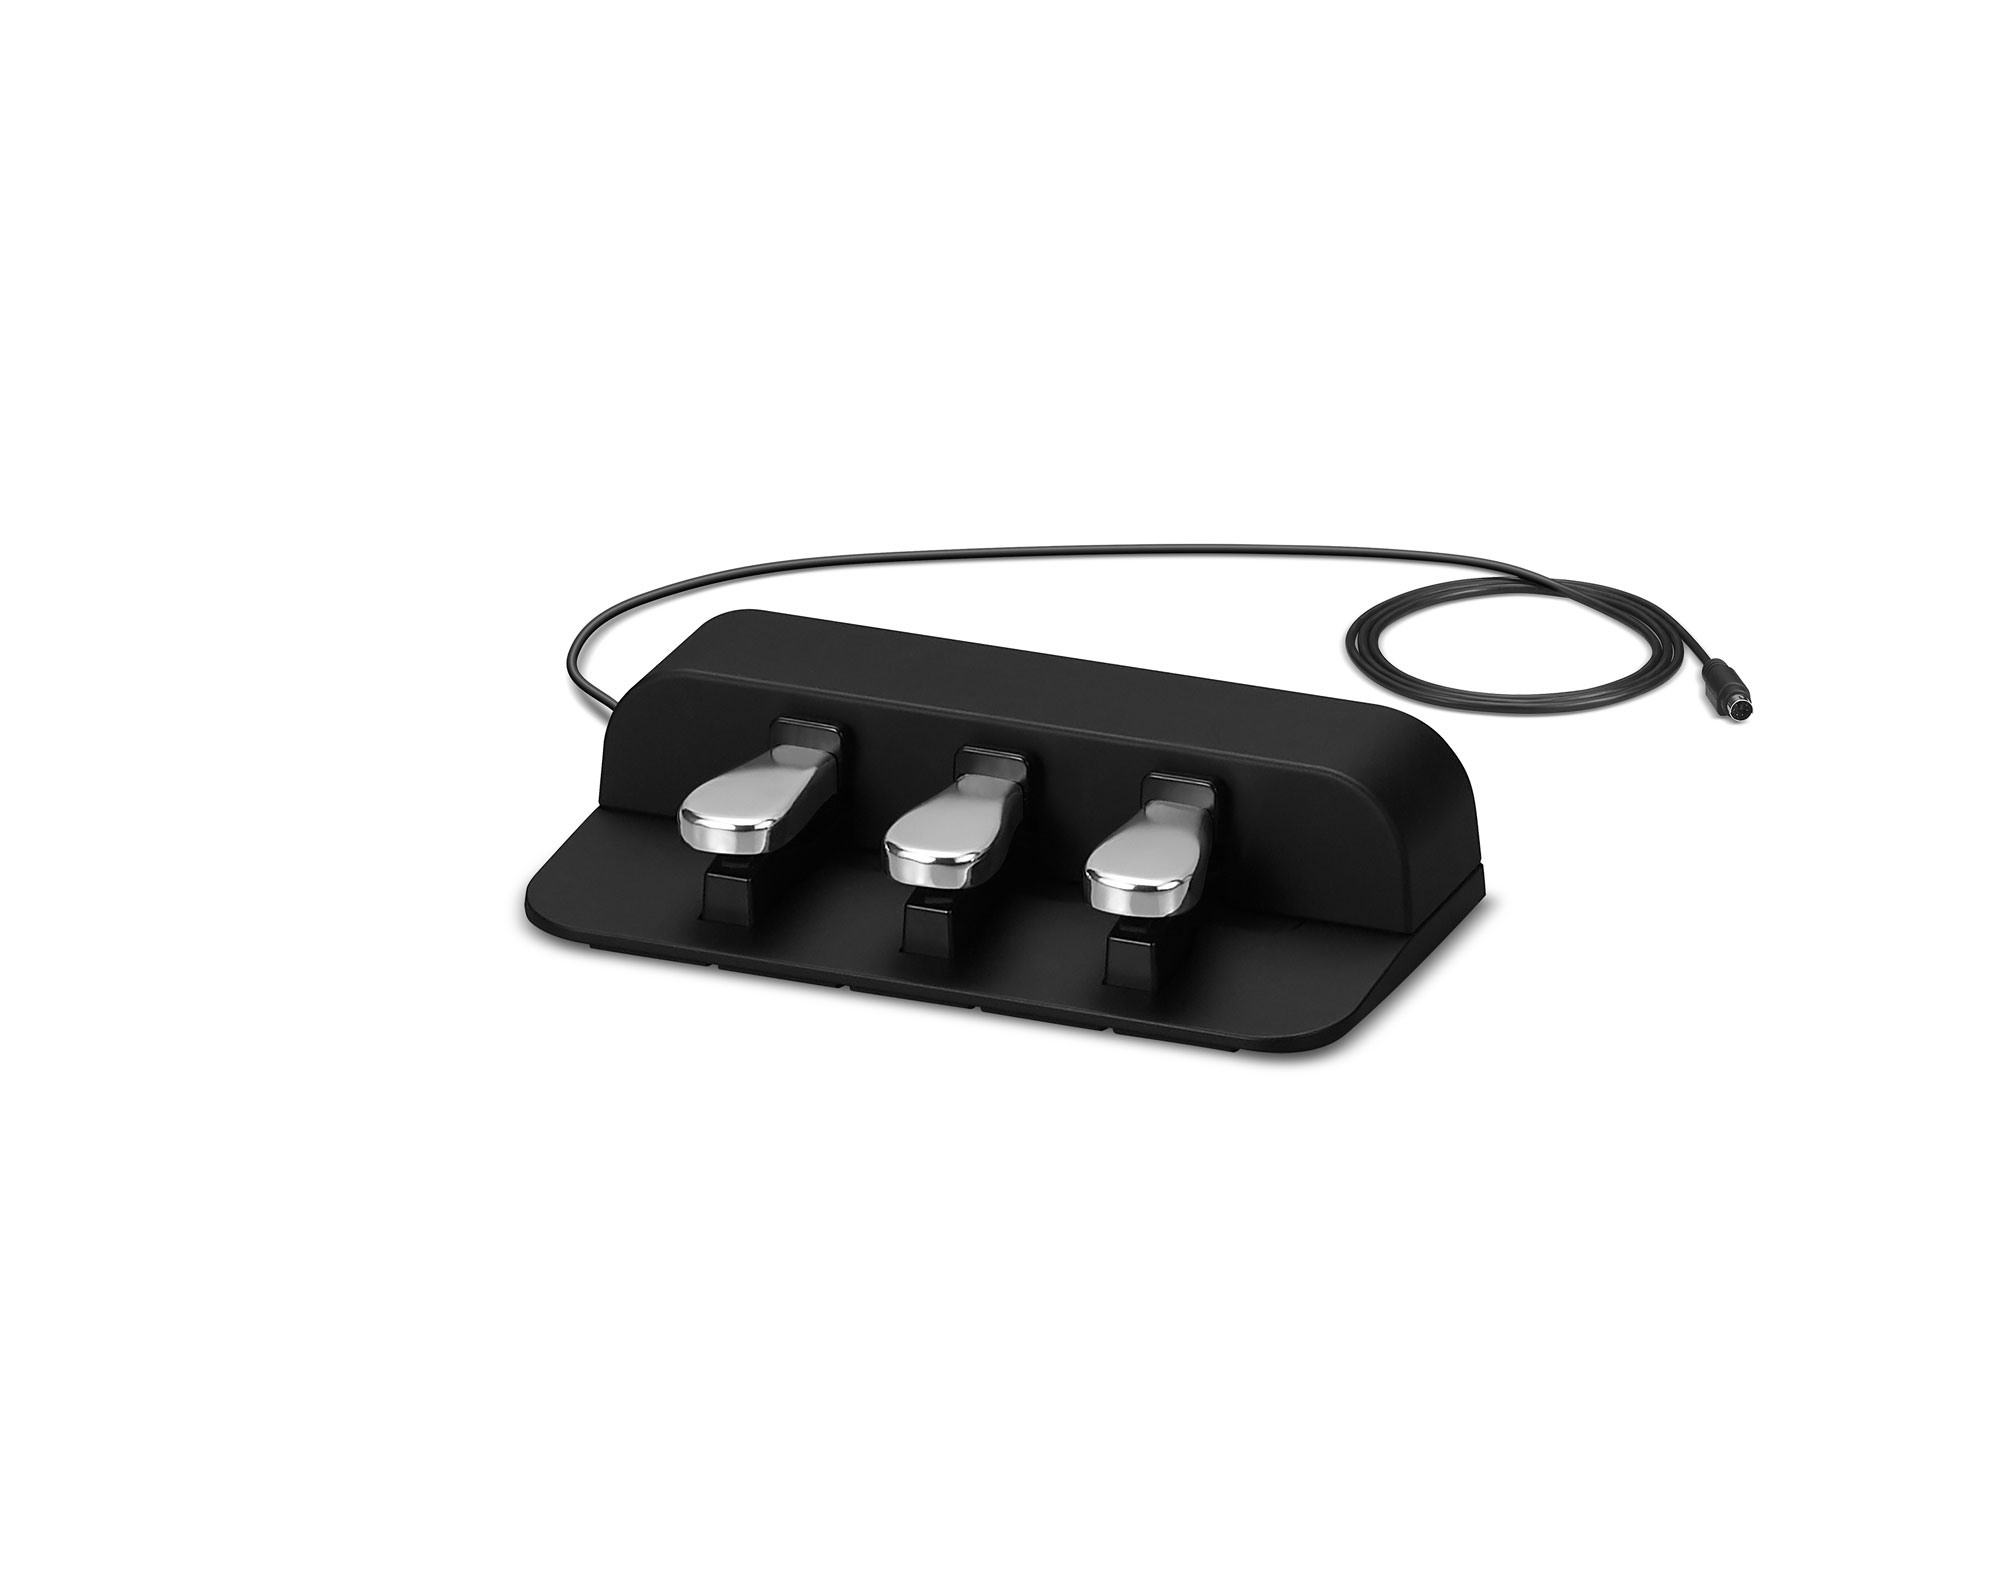 Casio SP-34 Trepedalsenhet för CDP-S350/PX-S1000/3000